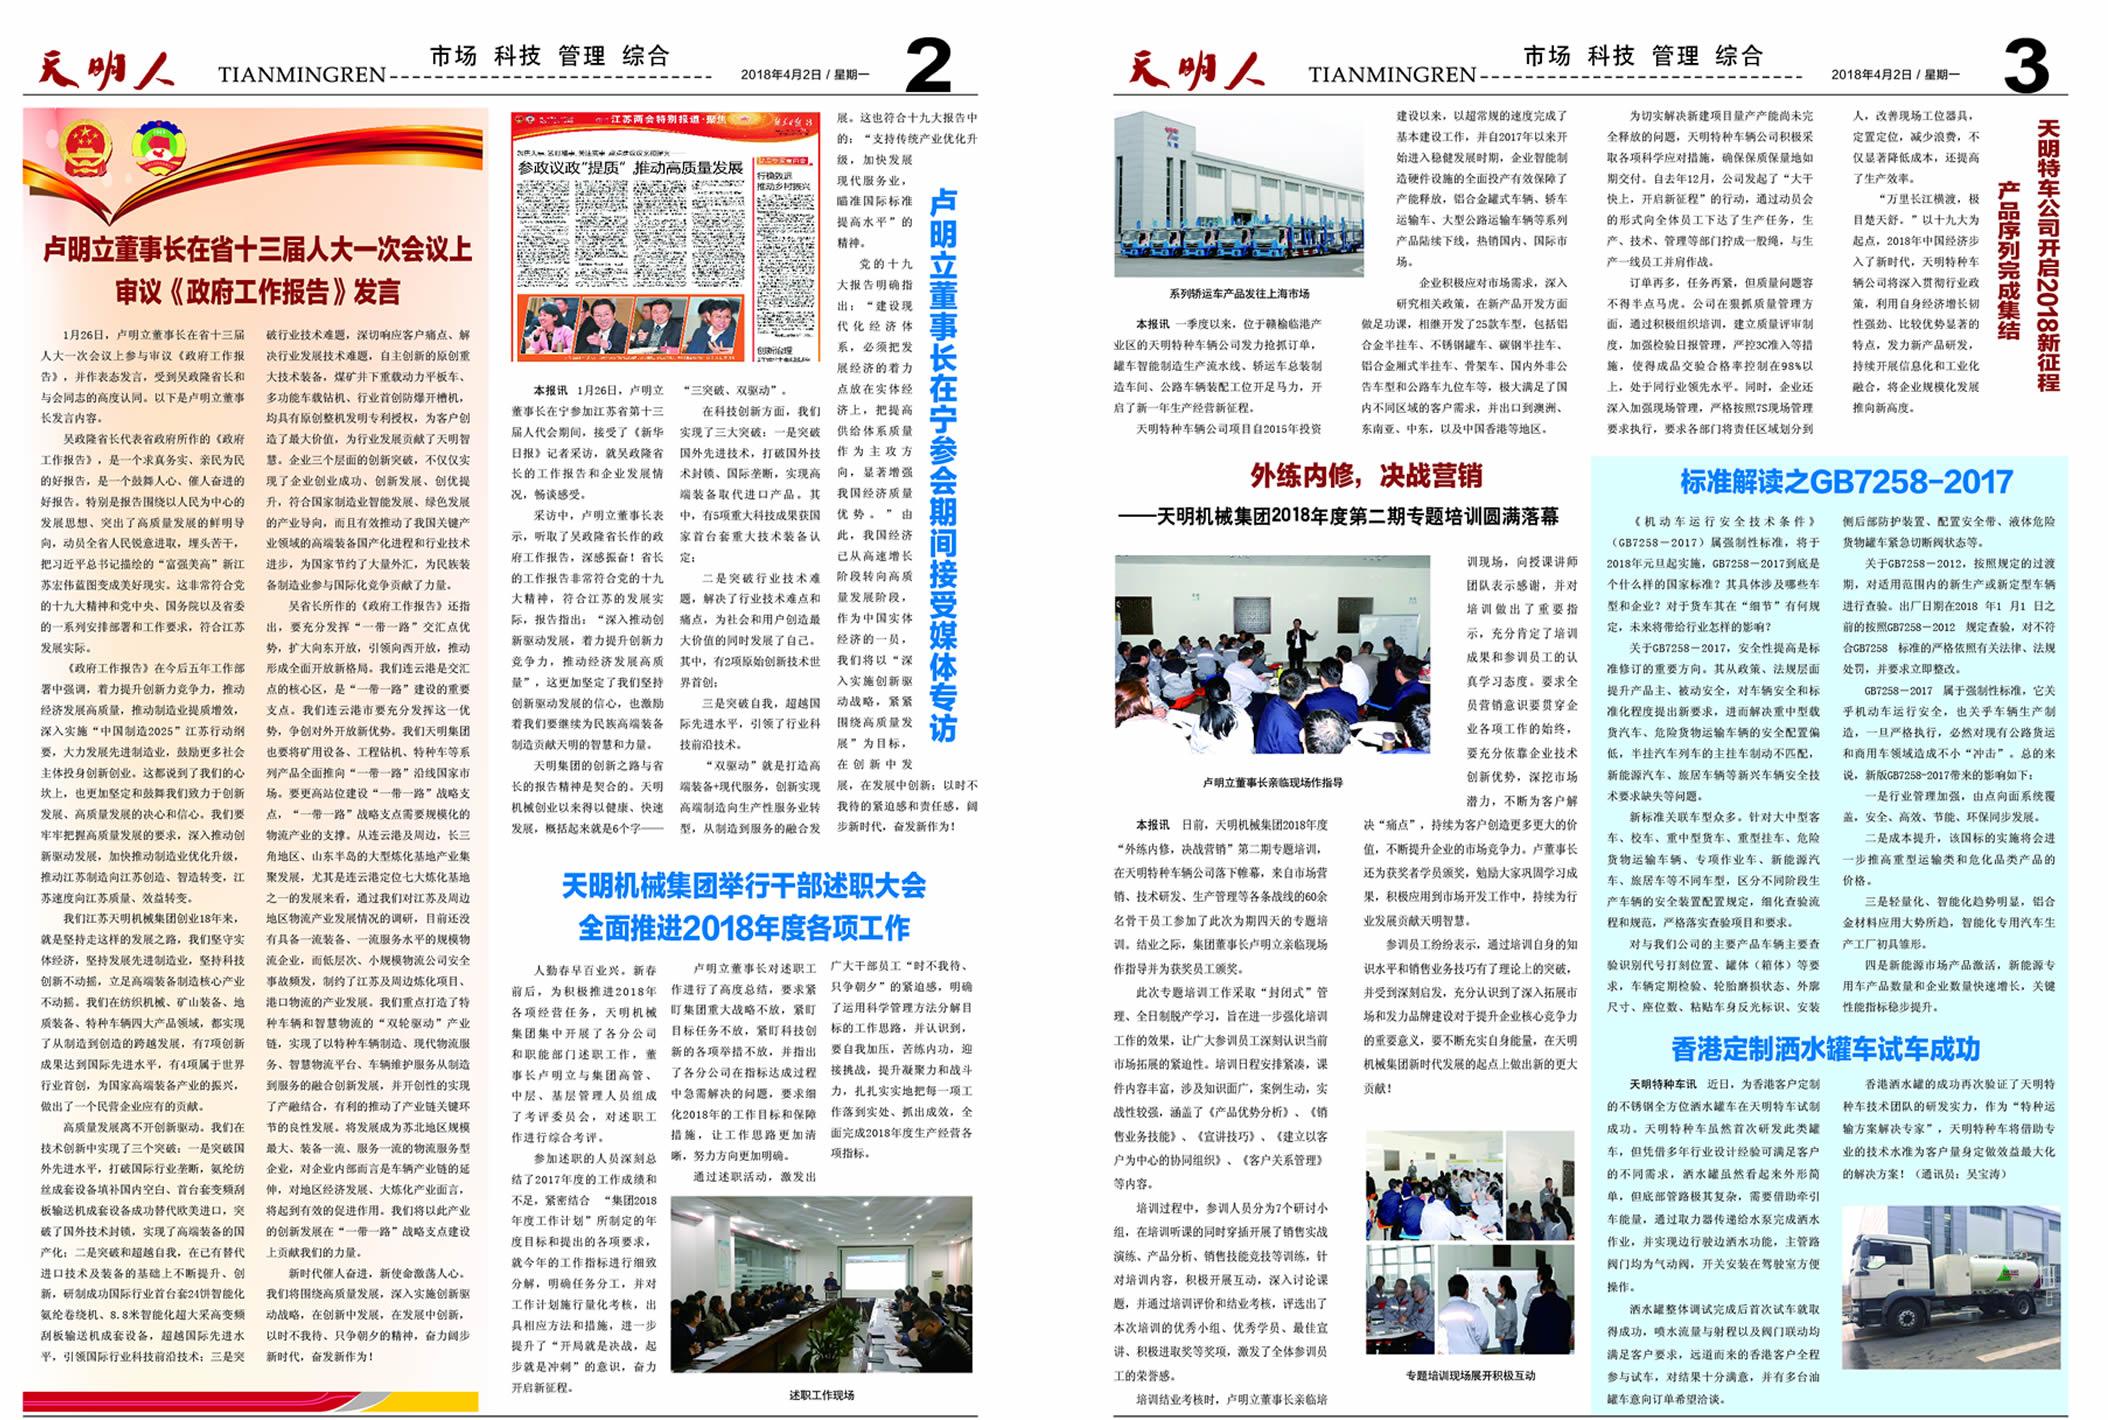 hg711皇冠国际_hg88皇冠国际平台_hg皇冠国际vip首页人2018年第二期(总第115期)2、3版